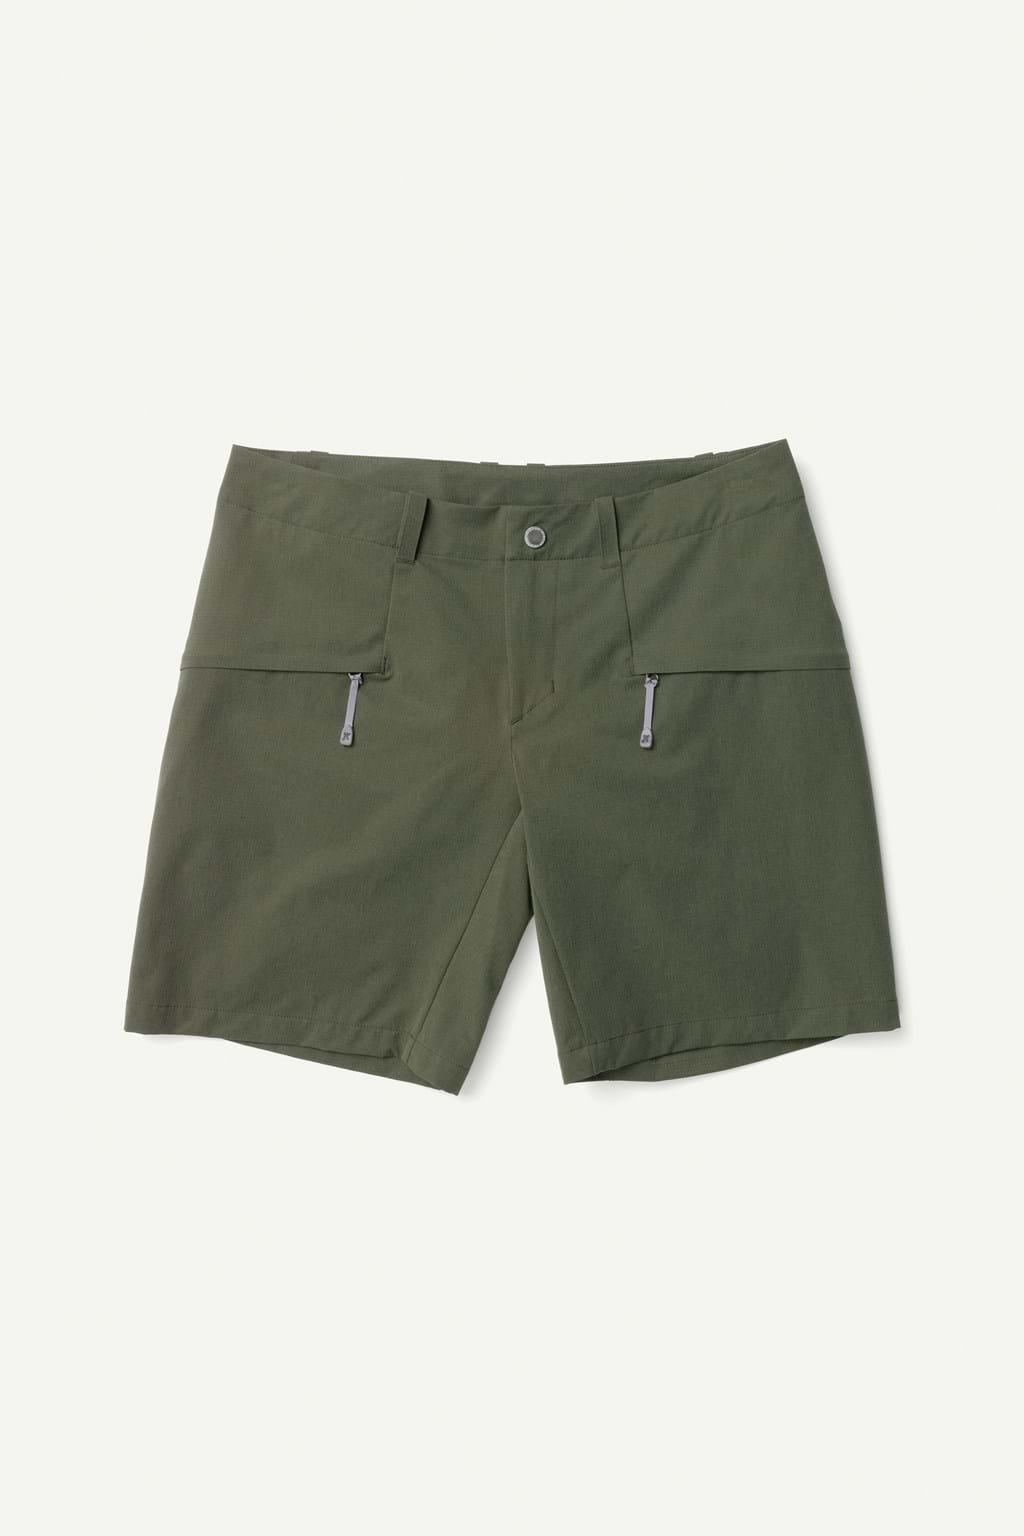 HOUDINI W's Daybreak Pants